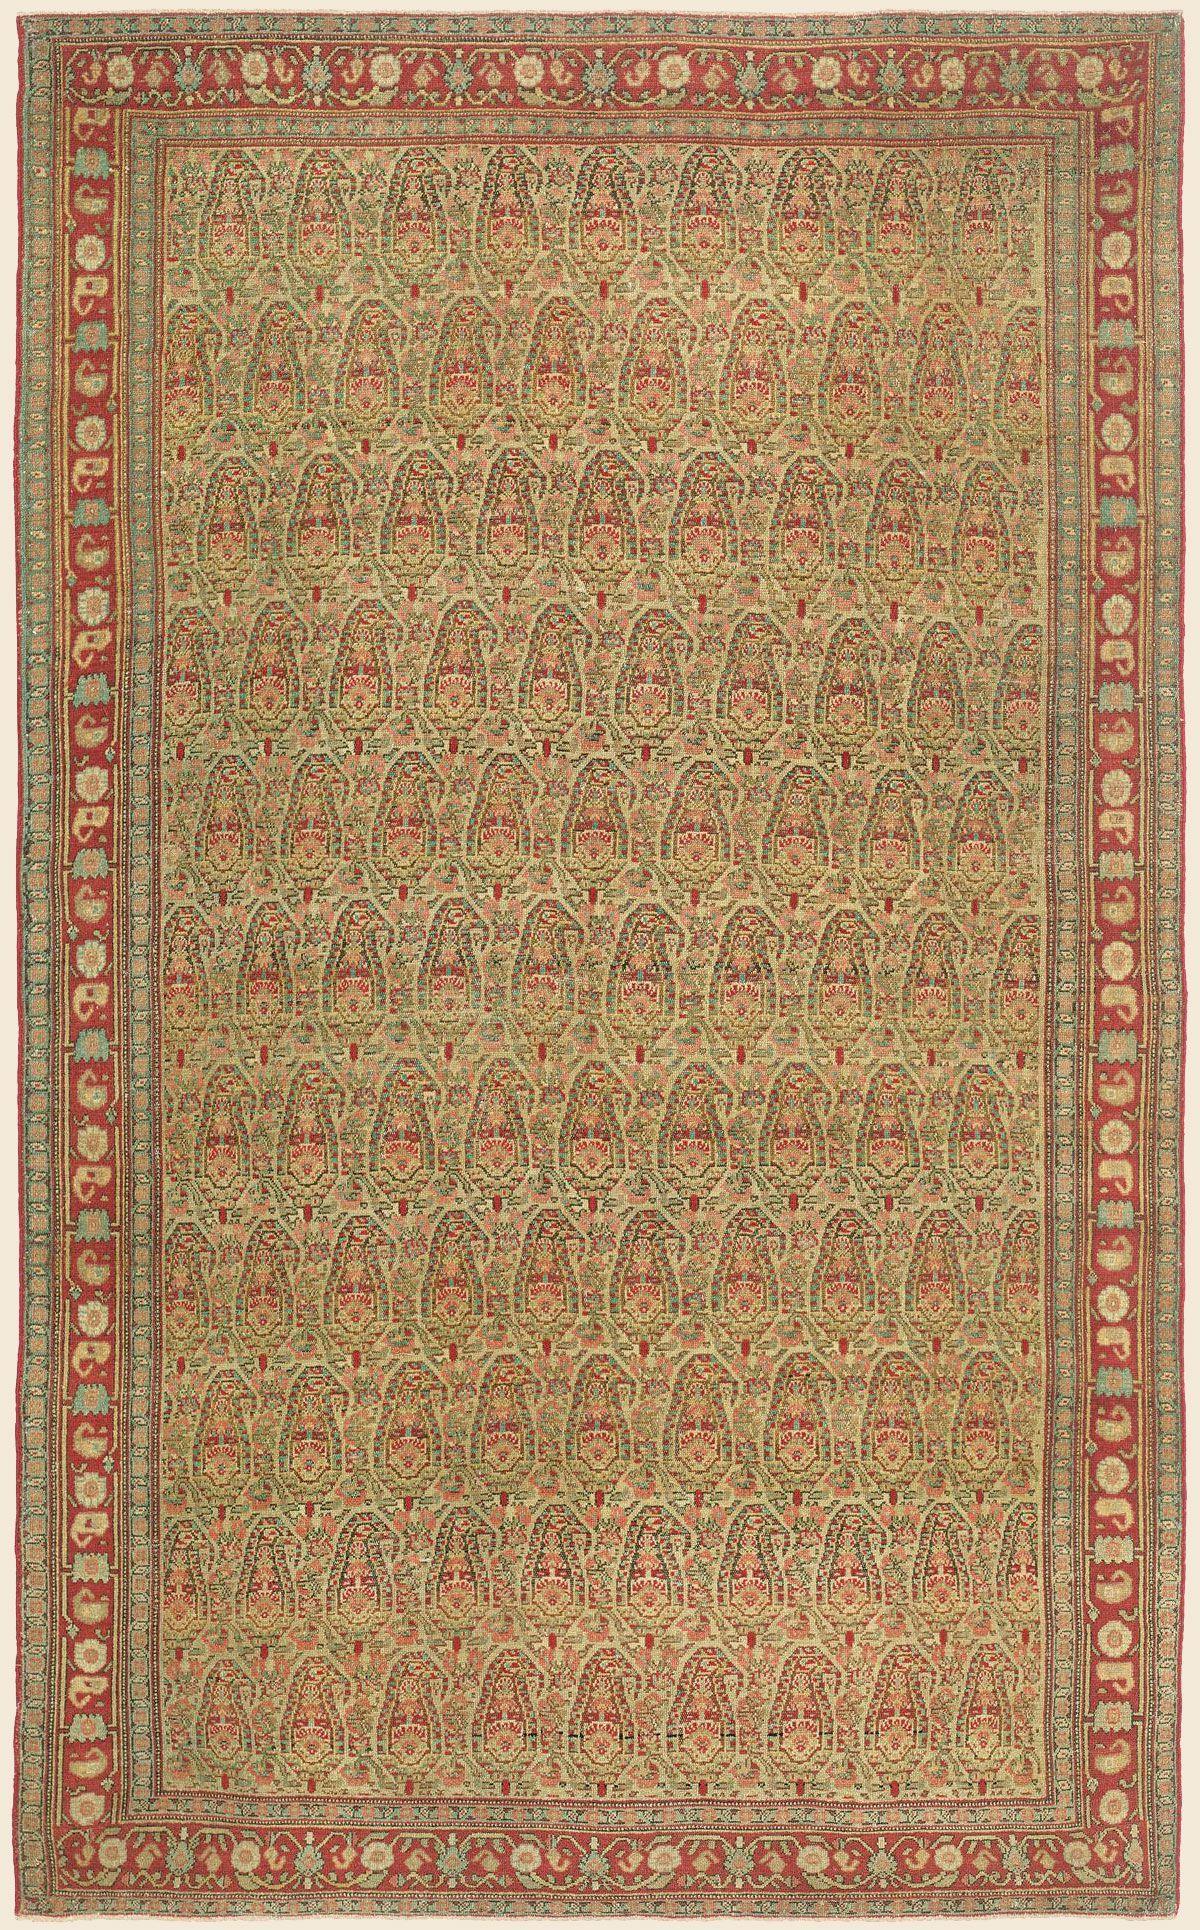 Fine Persian Carpet Gallery - Claremont Rug Company SENNEH.